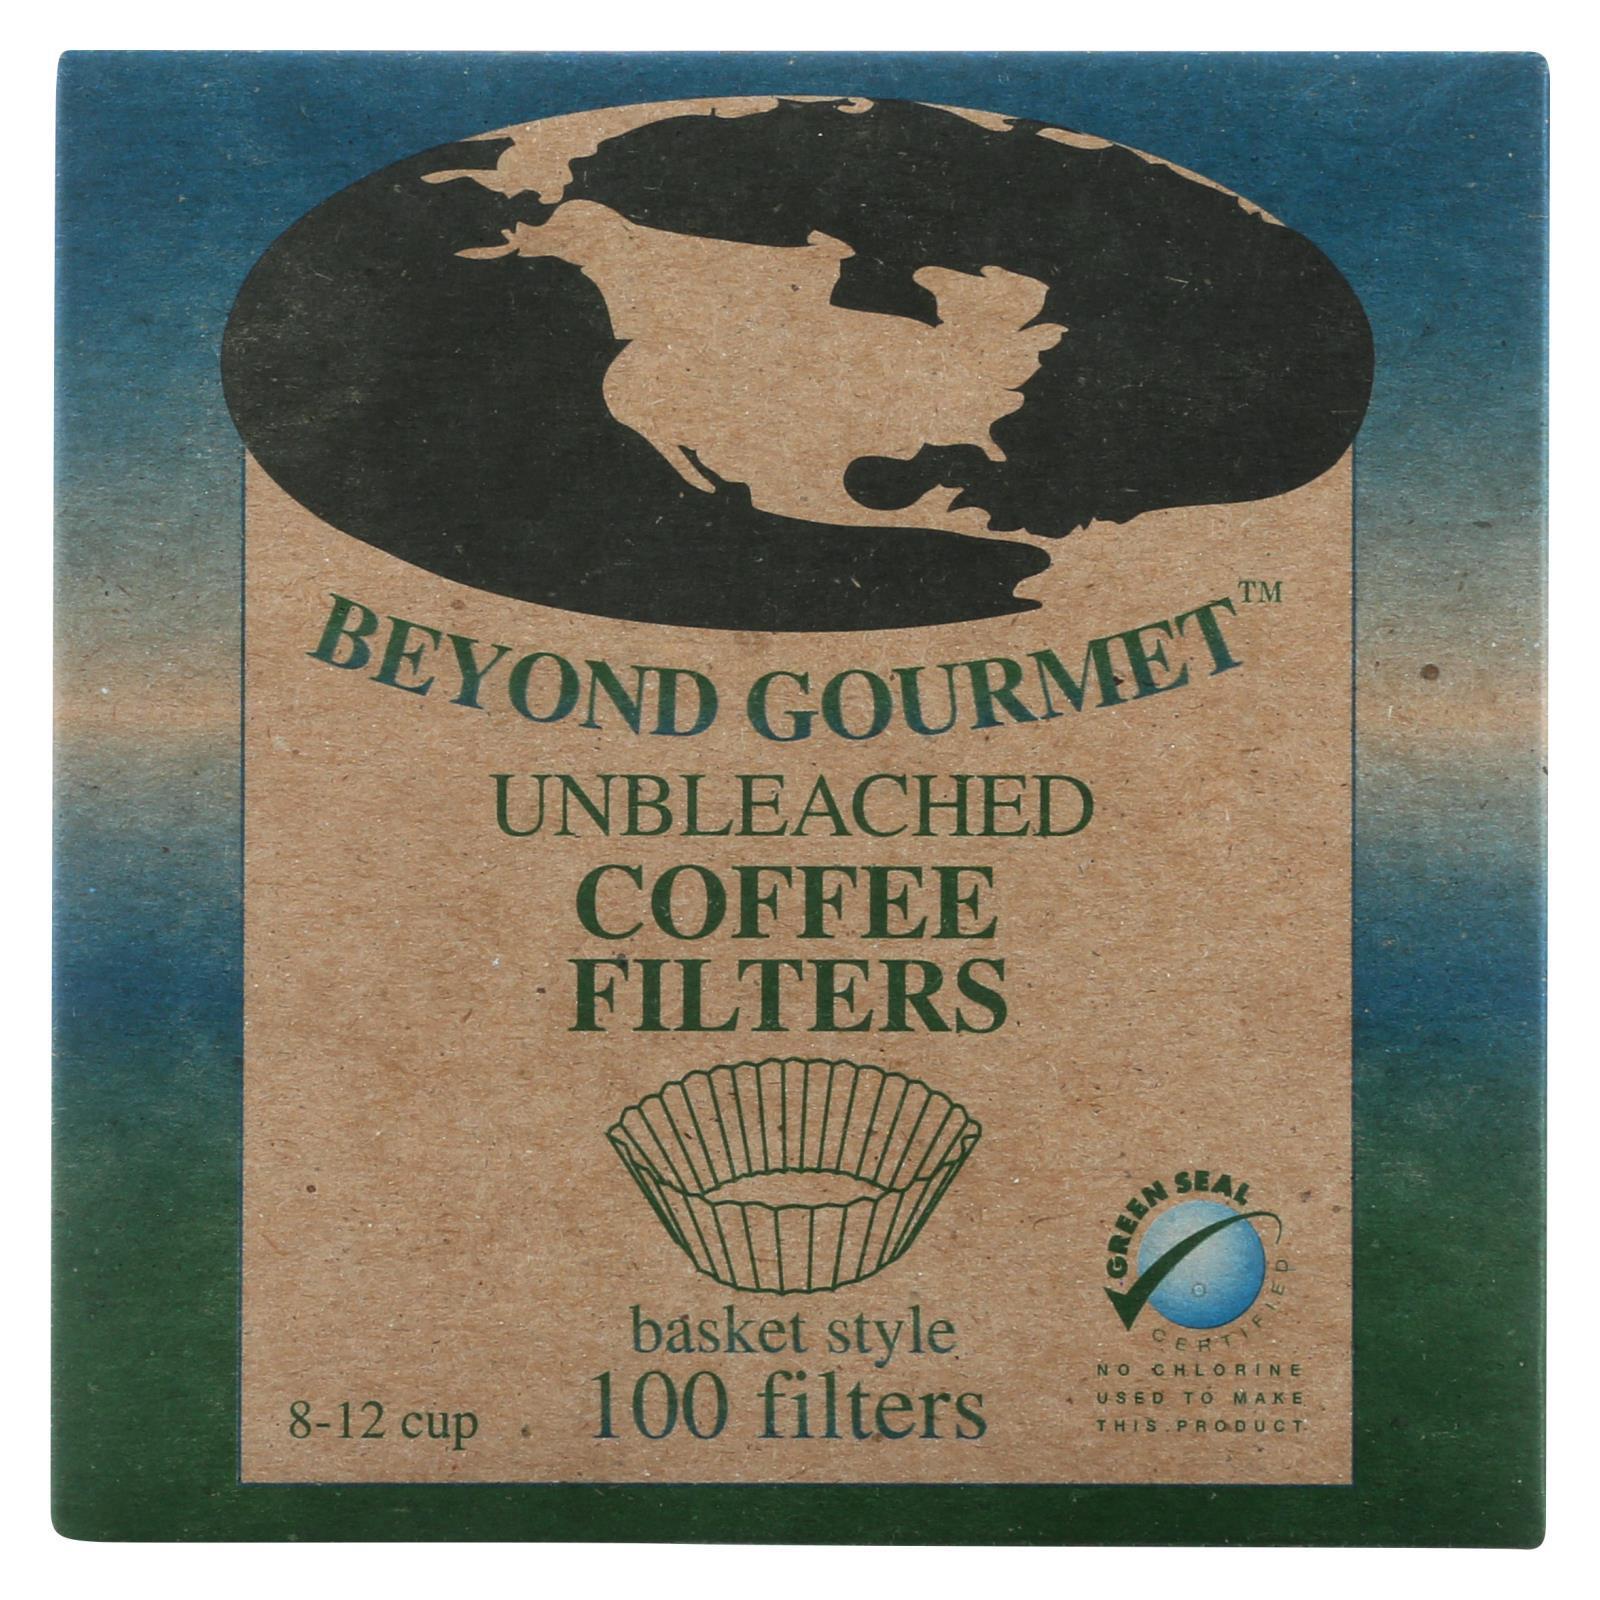 Beyond Gourmet Coffee Filters - Basket - Unbleached - 100 Count